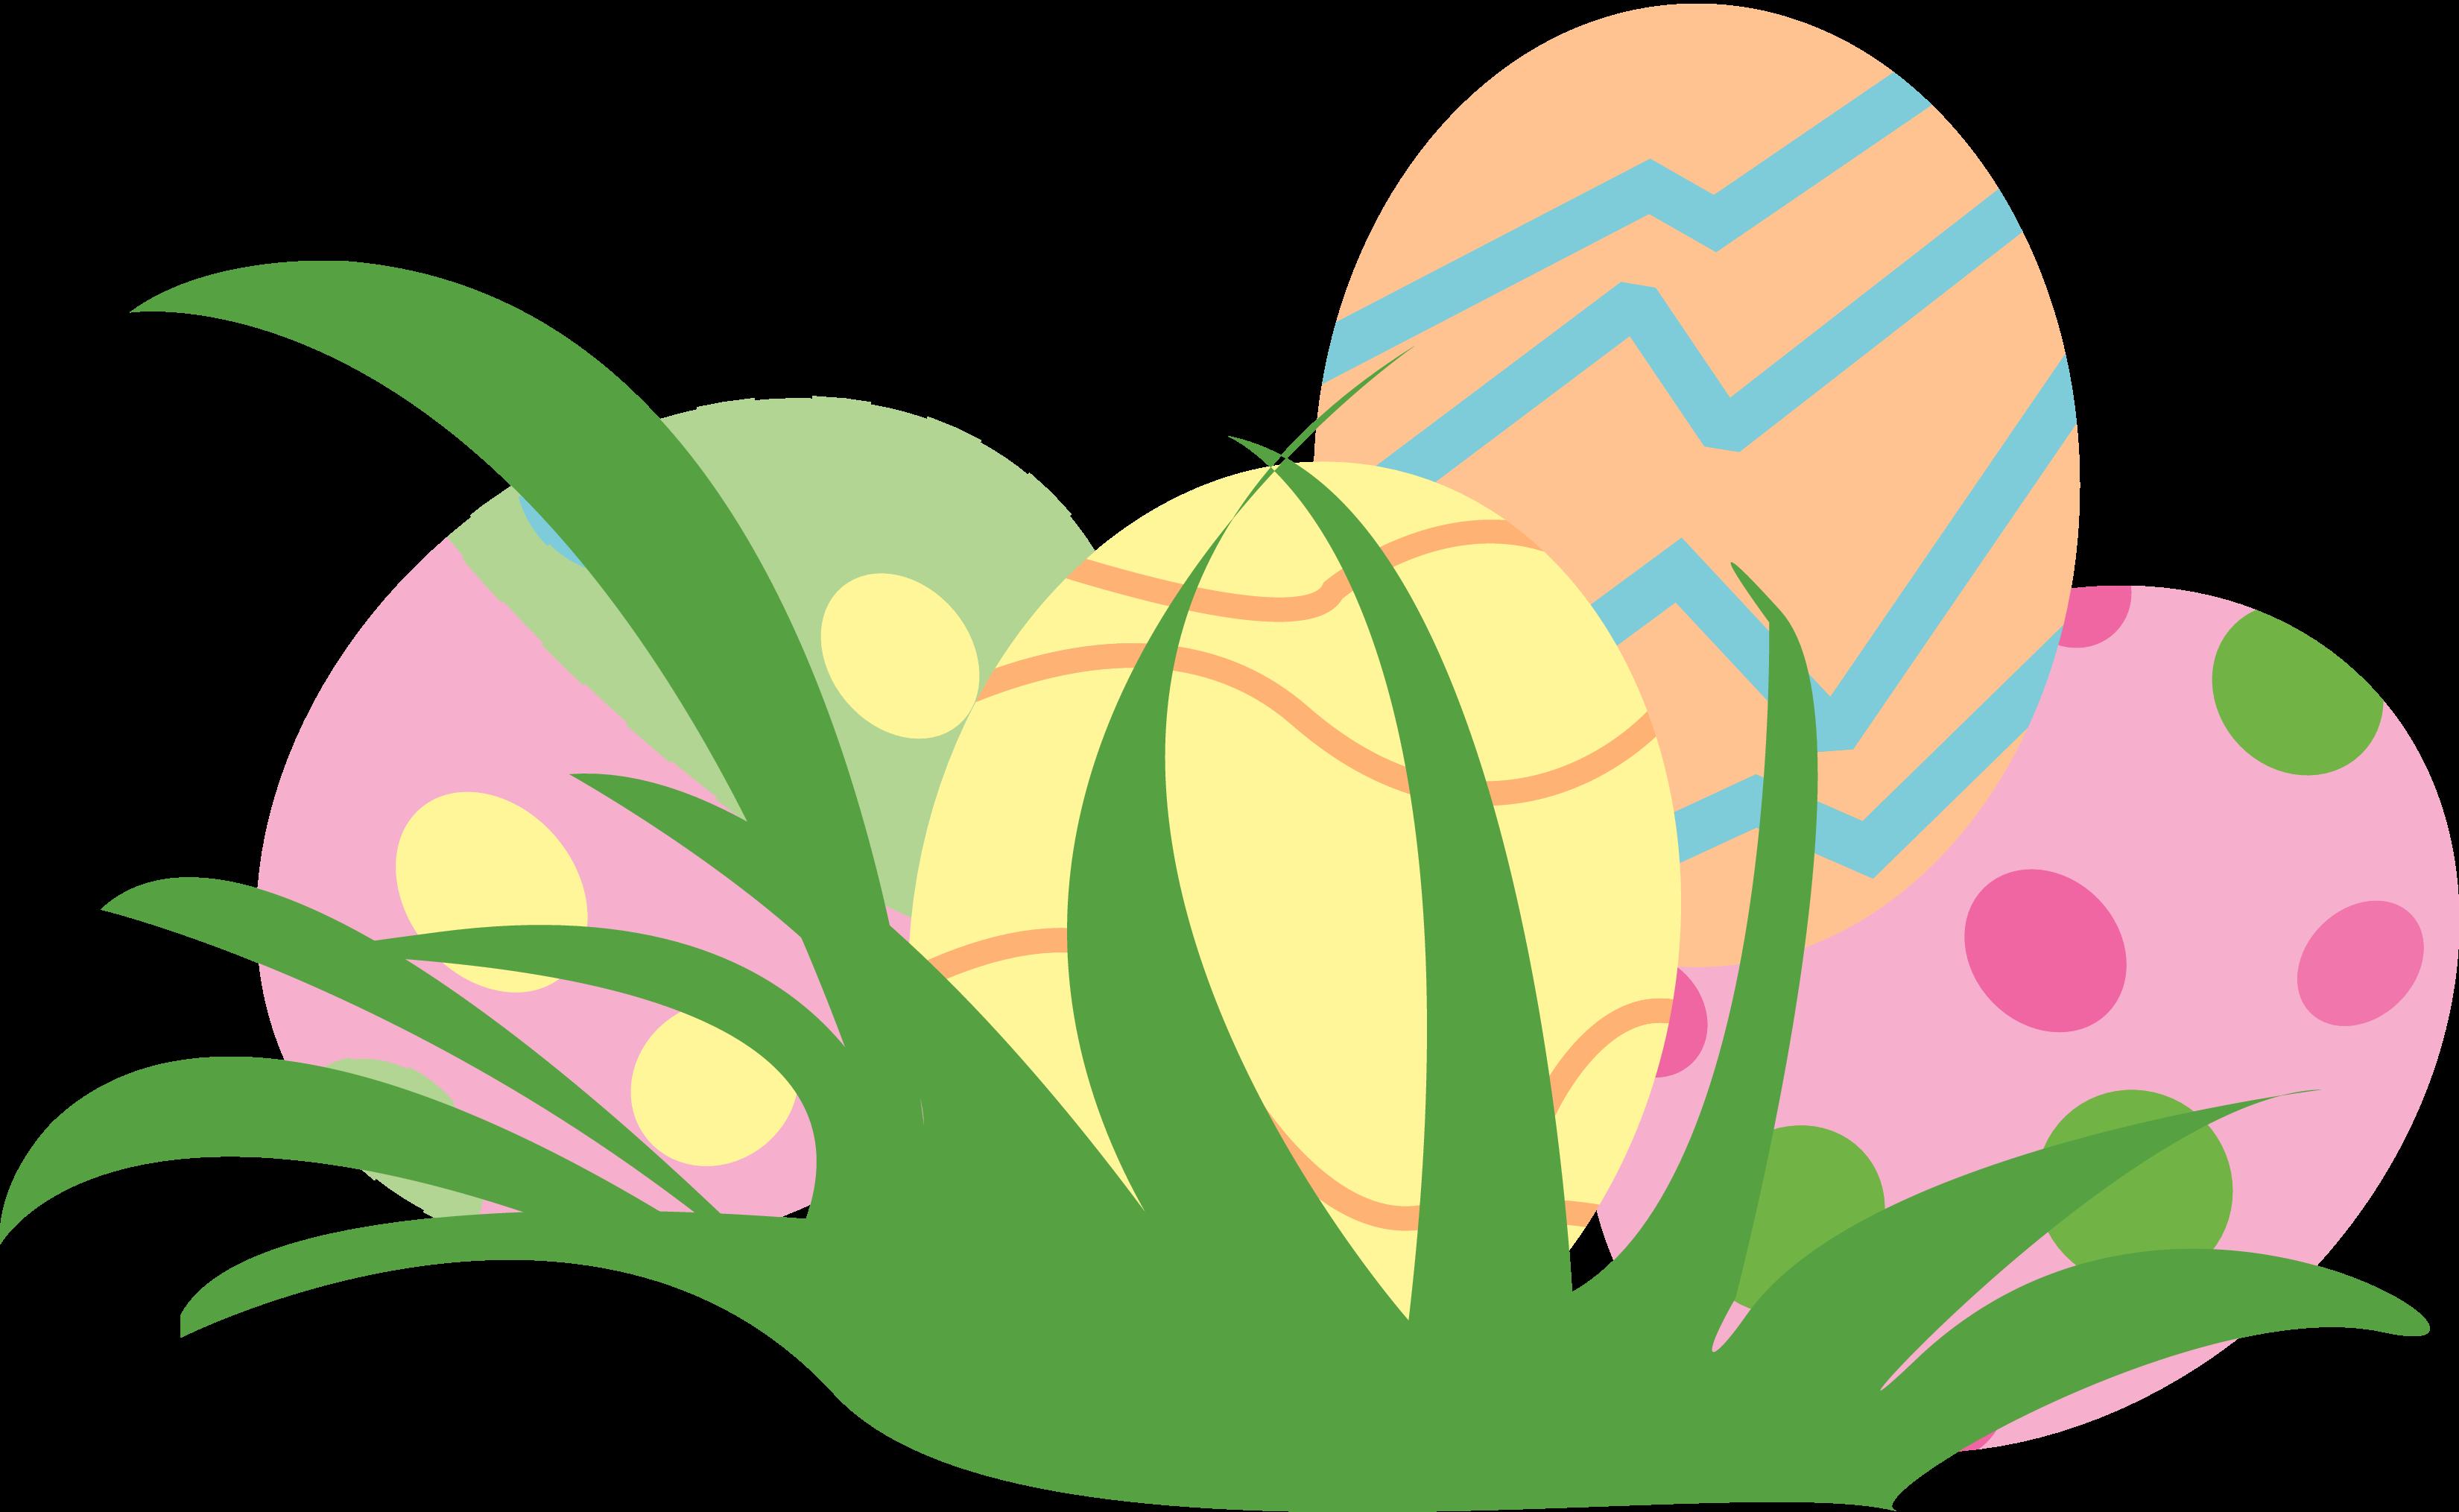 Free easter egg border clip art image free stock Easter Eggs Clipart (51+) image free stock